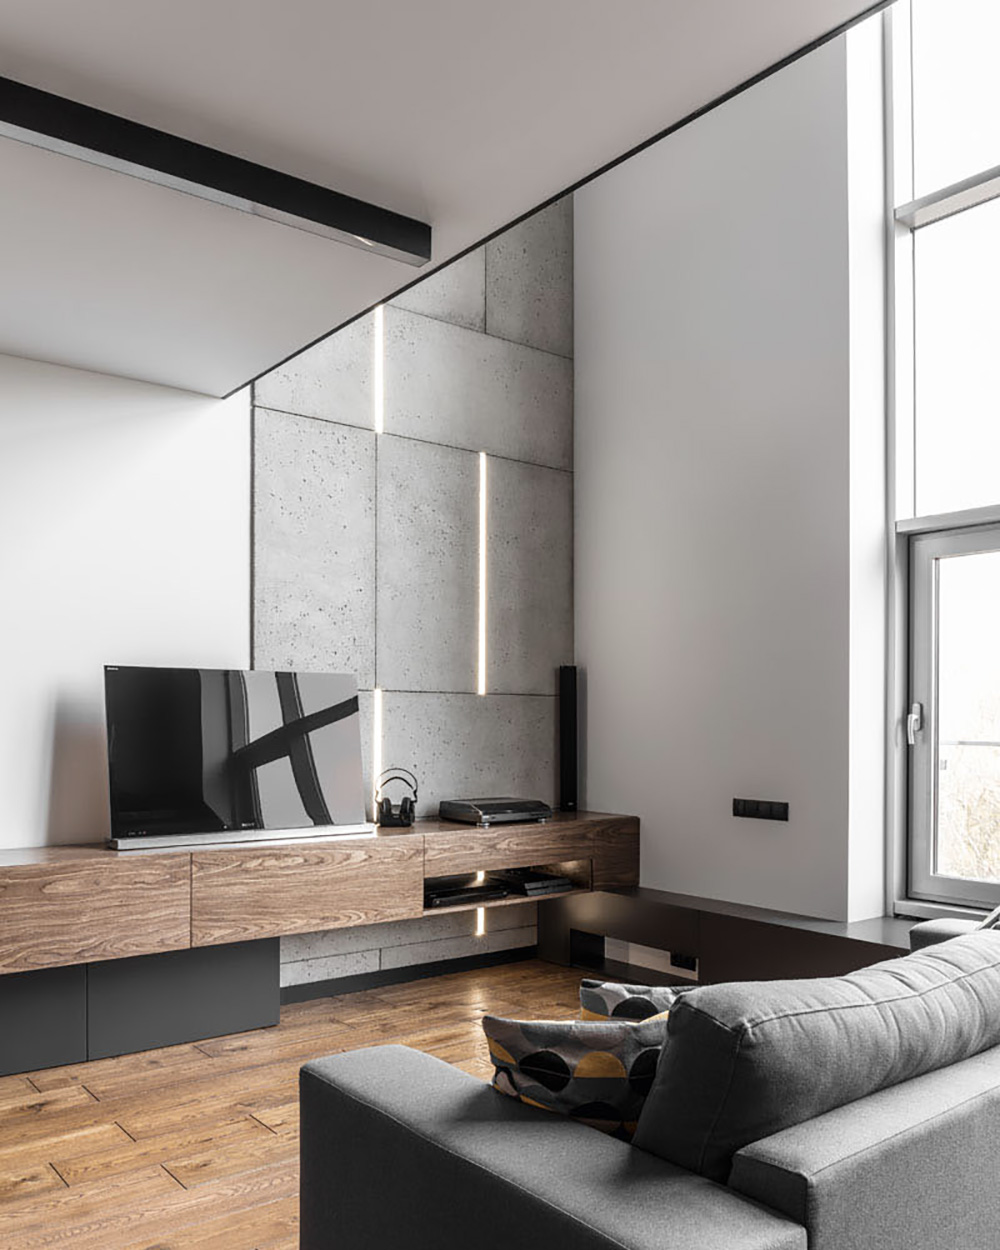 Un loft mezzanine contemporain   Shake My Blog